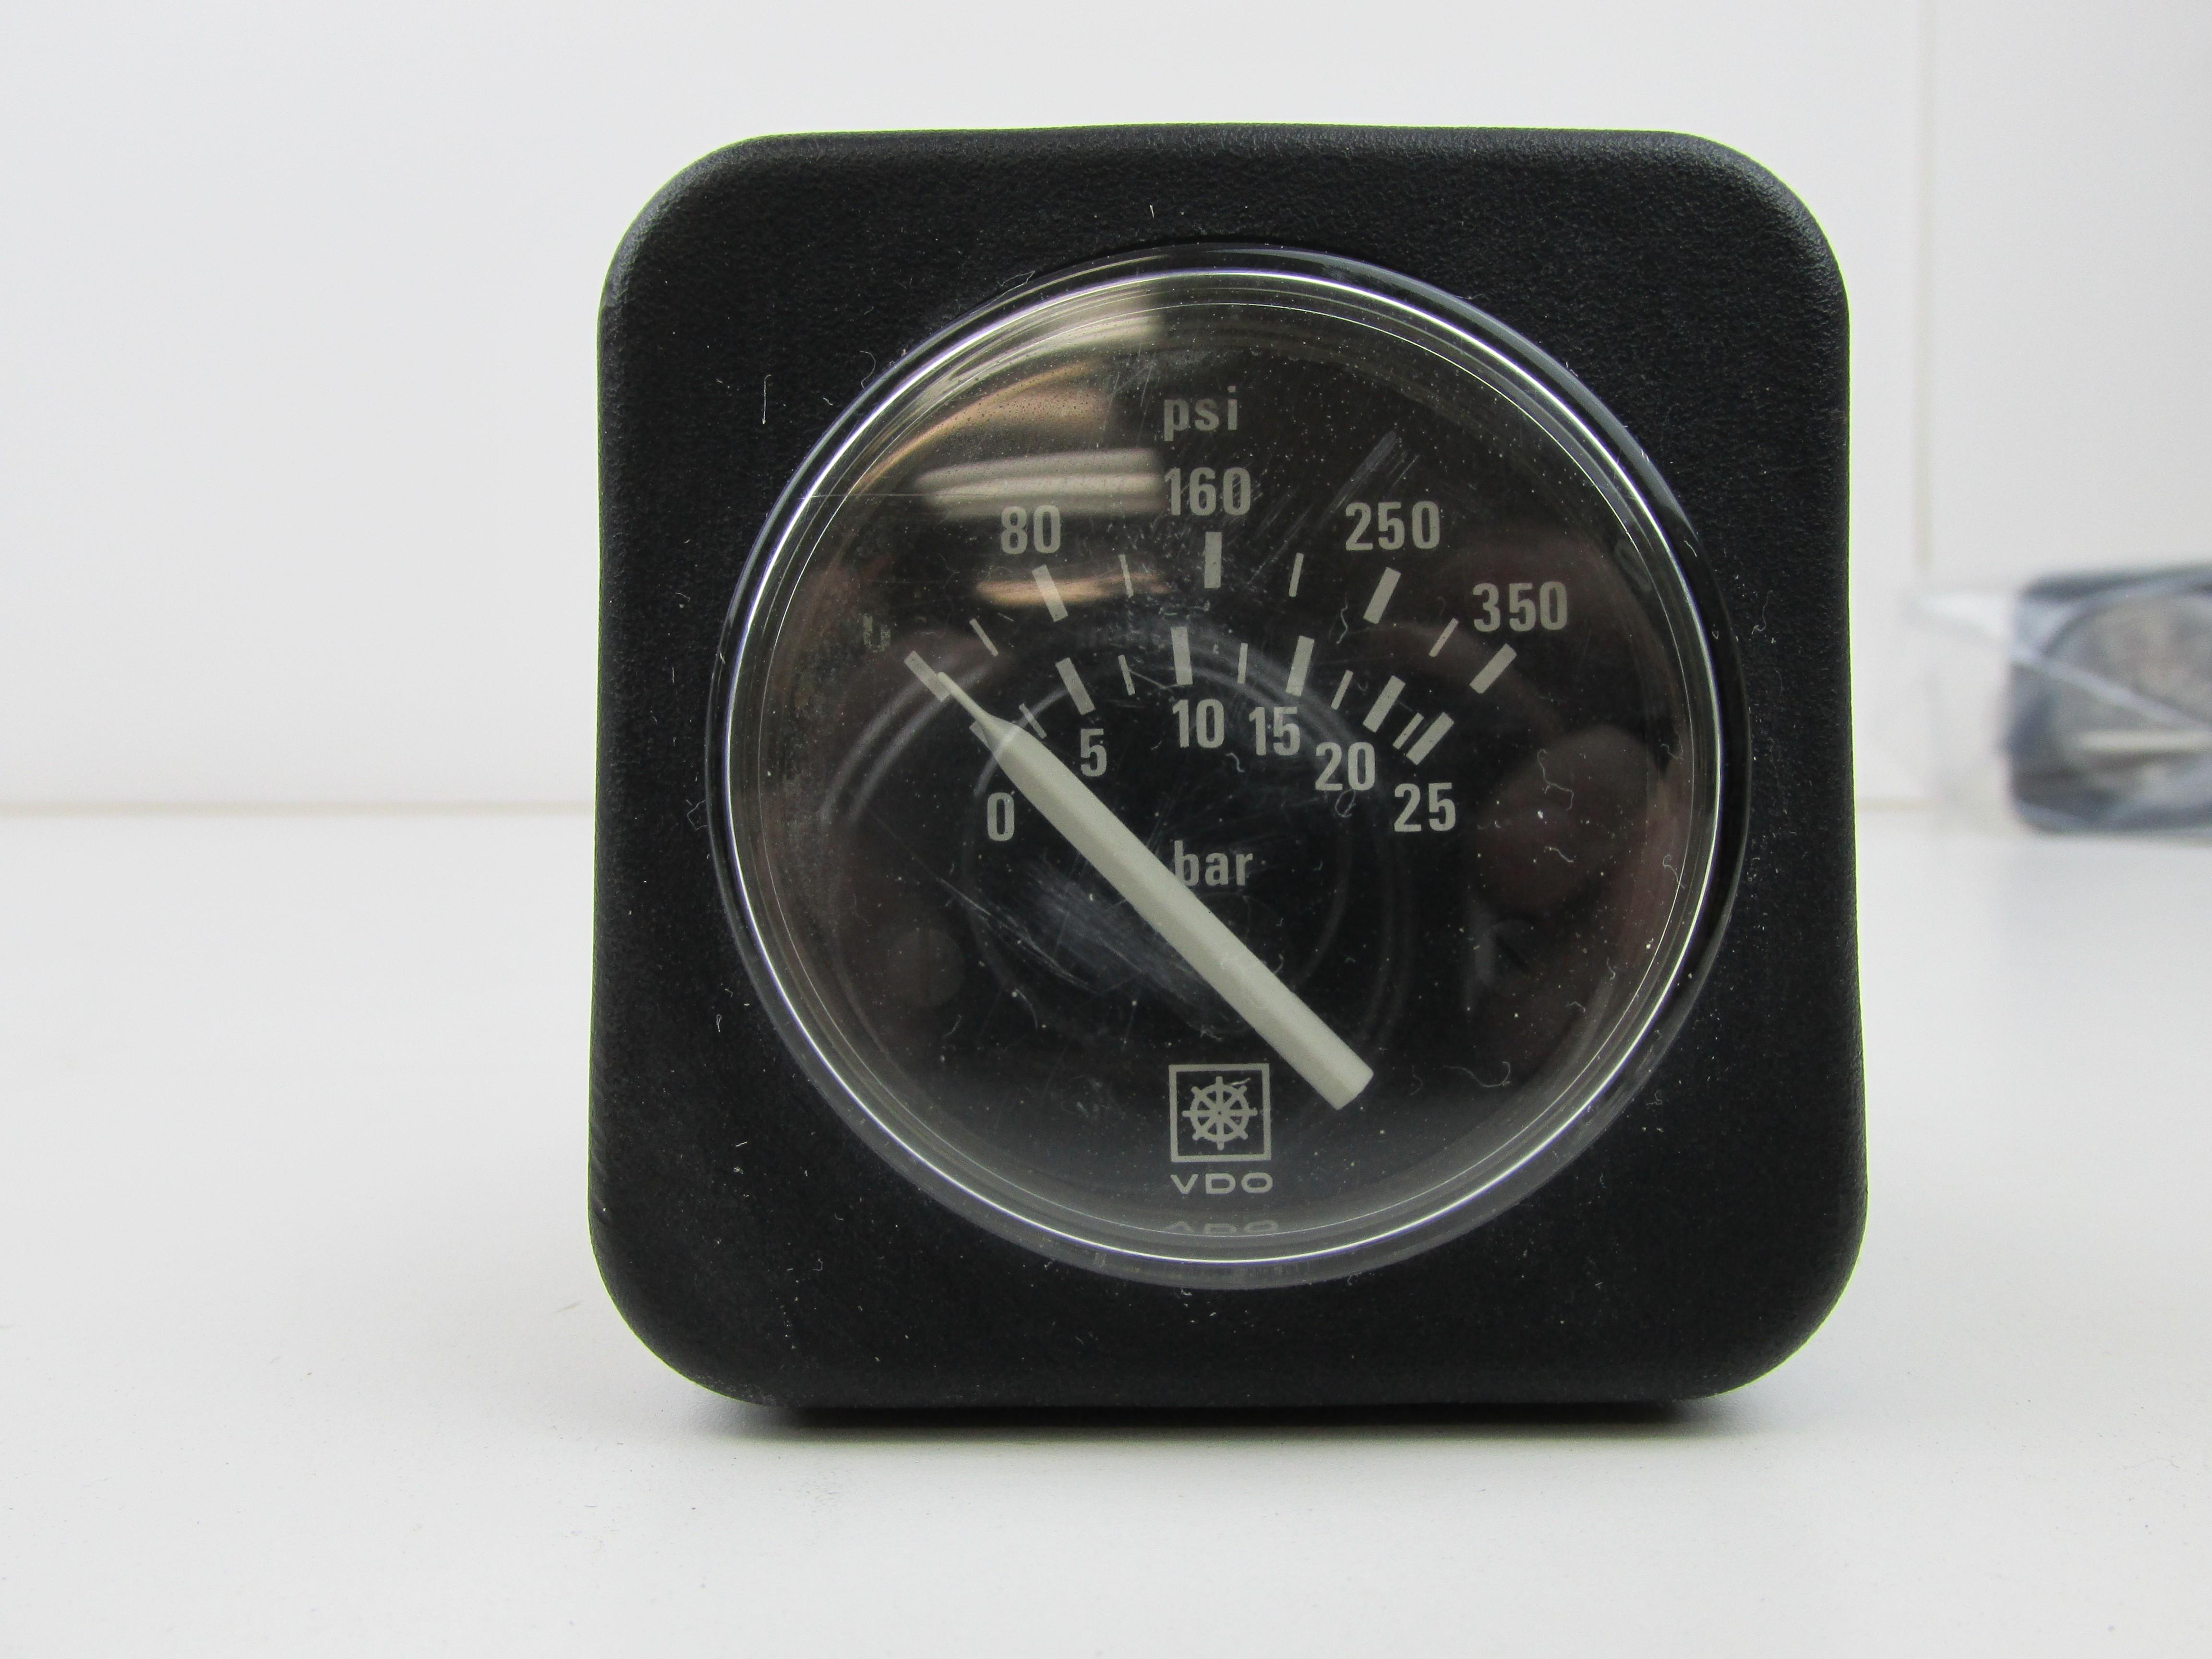 Vdo Oil Electric Gauge Diagram Cummins Vdo 0 350 Psi Pressure Gauge Of Vdo Oil Electric Gauge Diagram